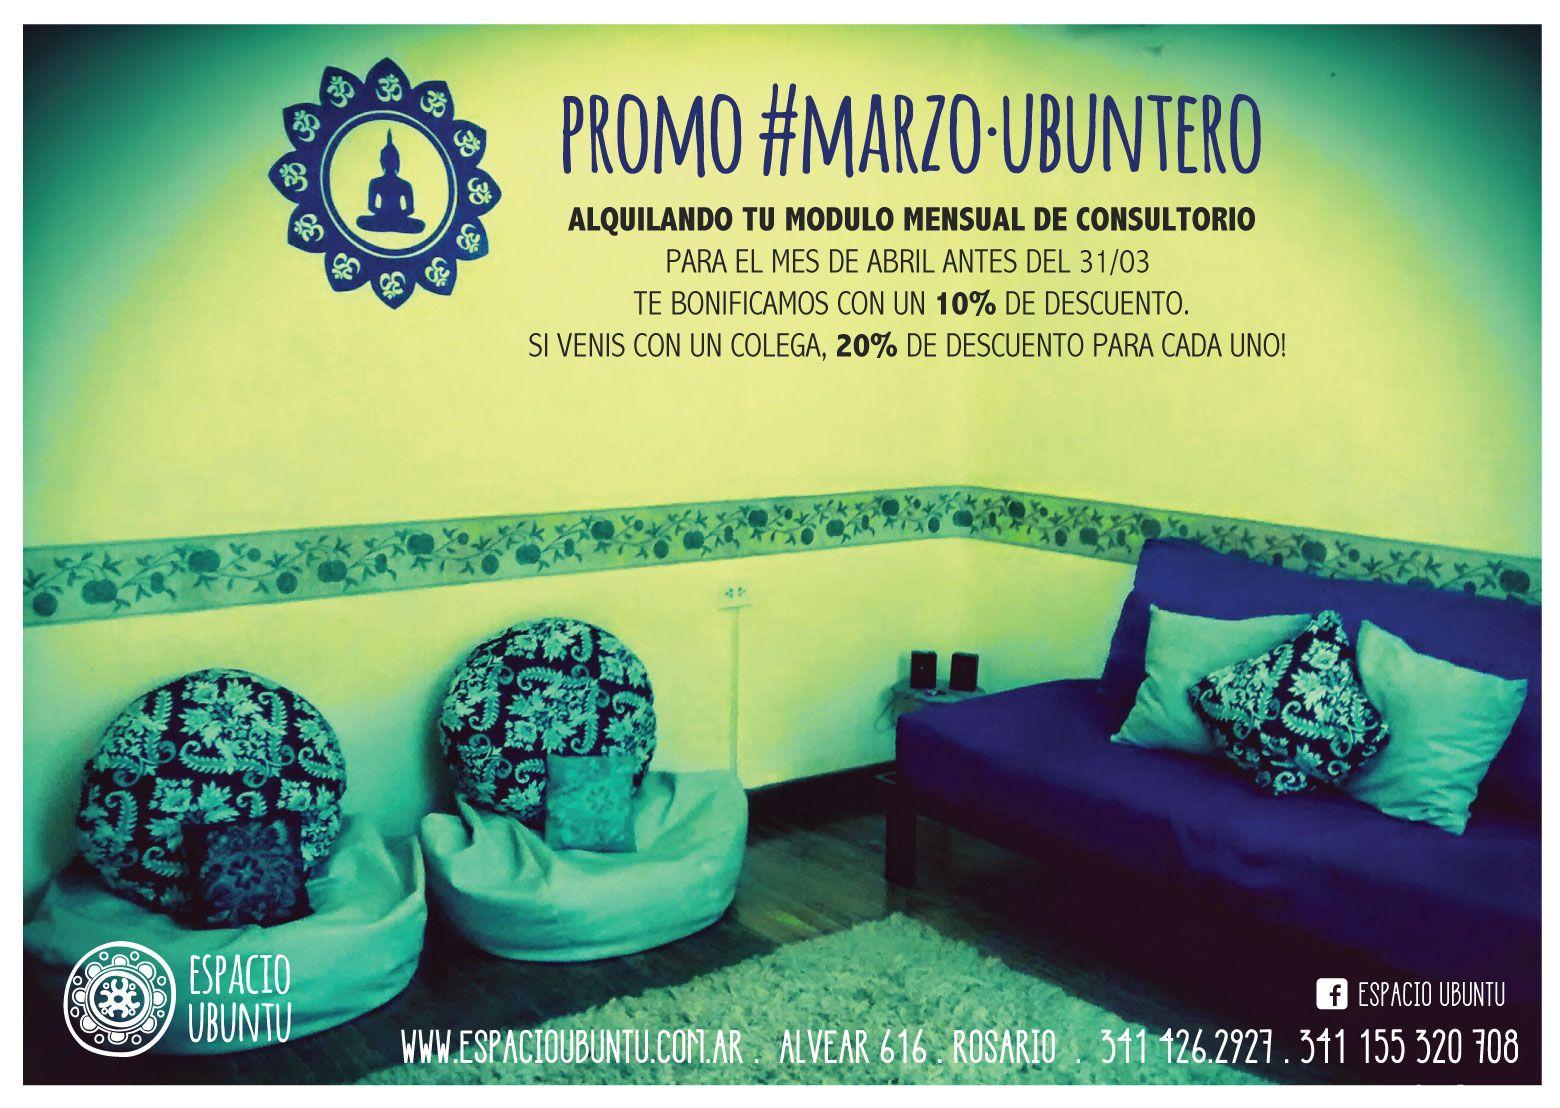 promo #marzo·ubuntero